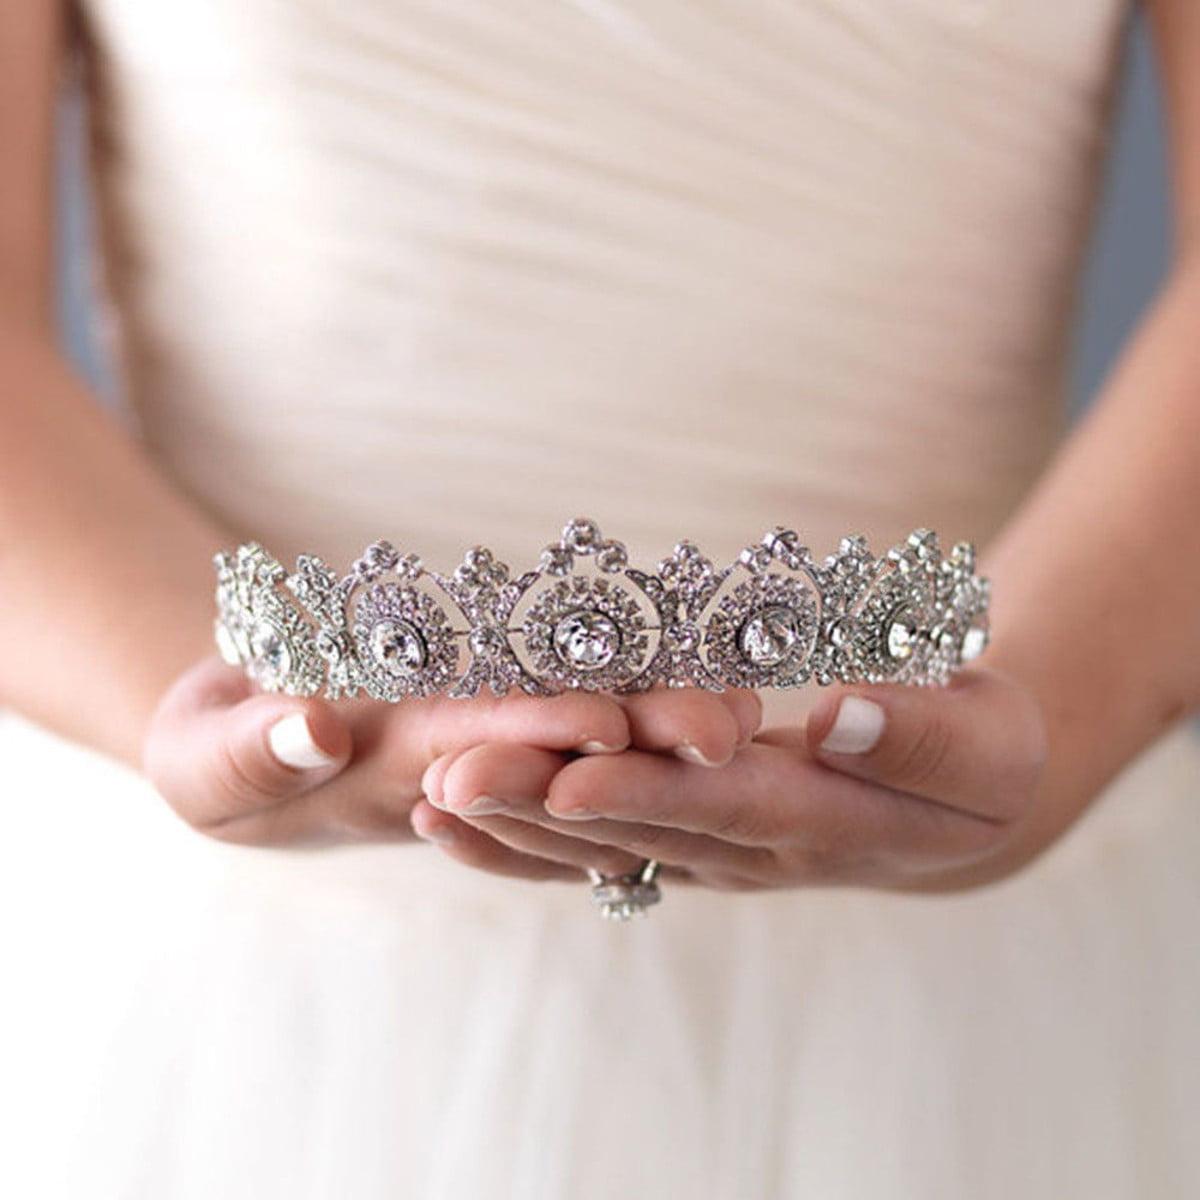 Prom Queen Quincea\u00f1era Pageant Sweet 16 Rhinestone Tiara Crown